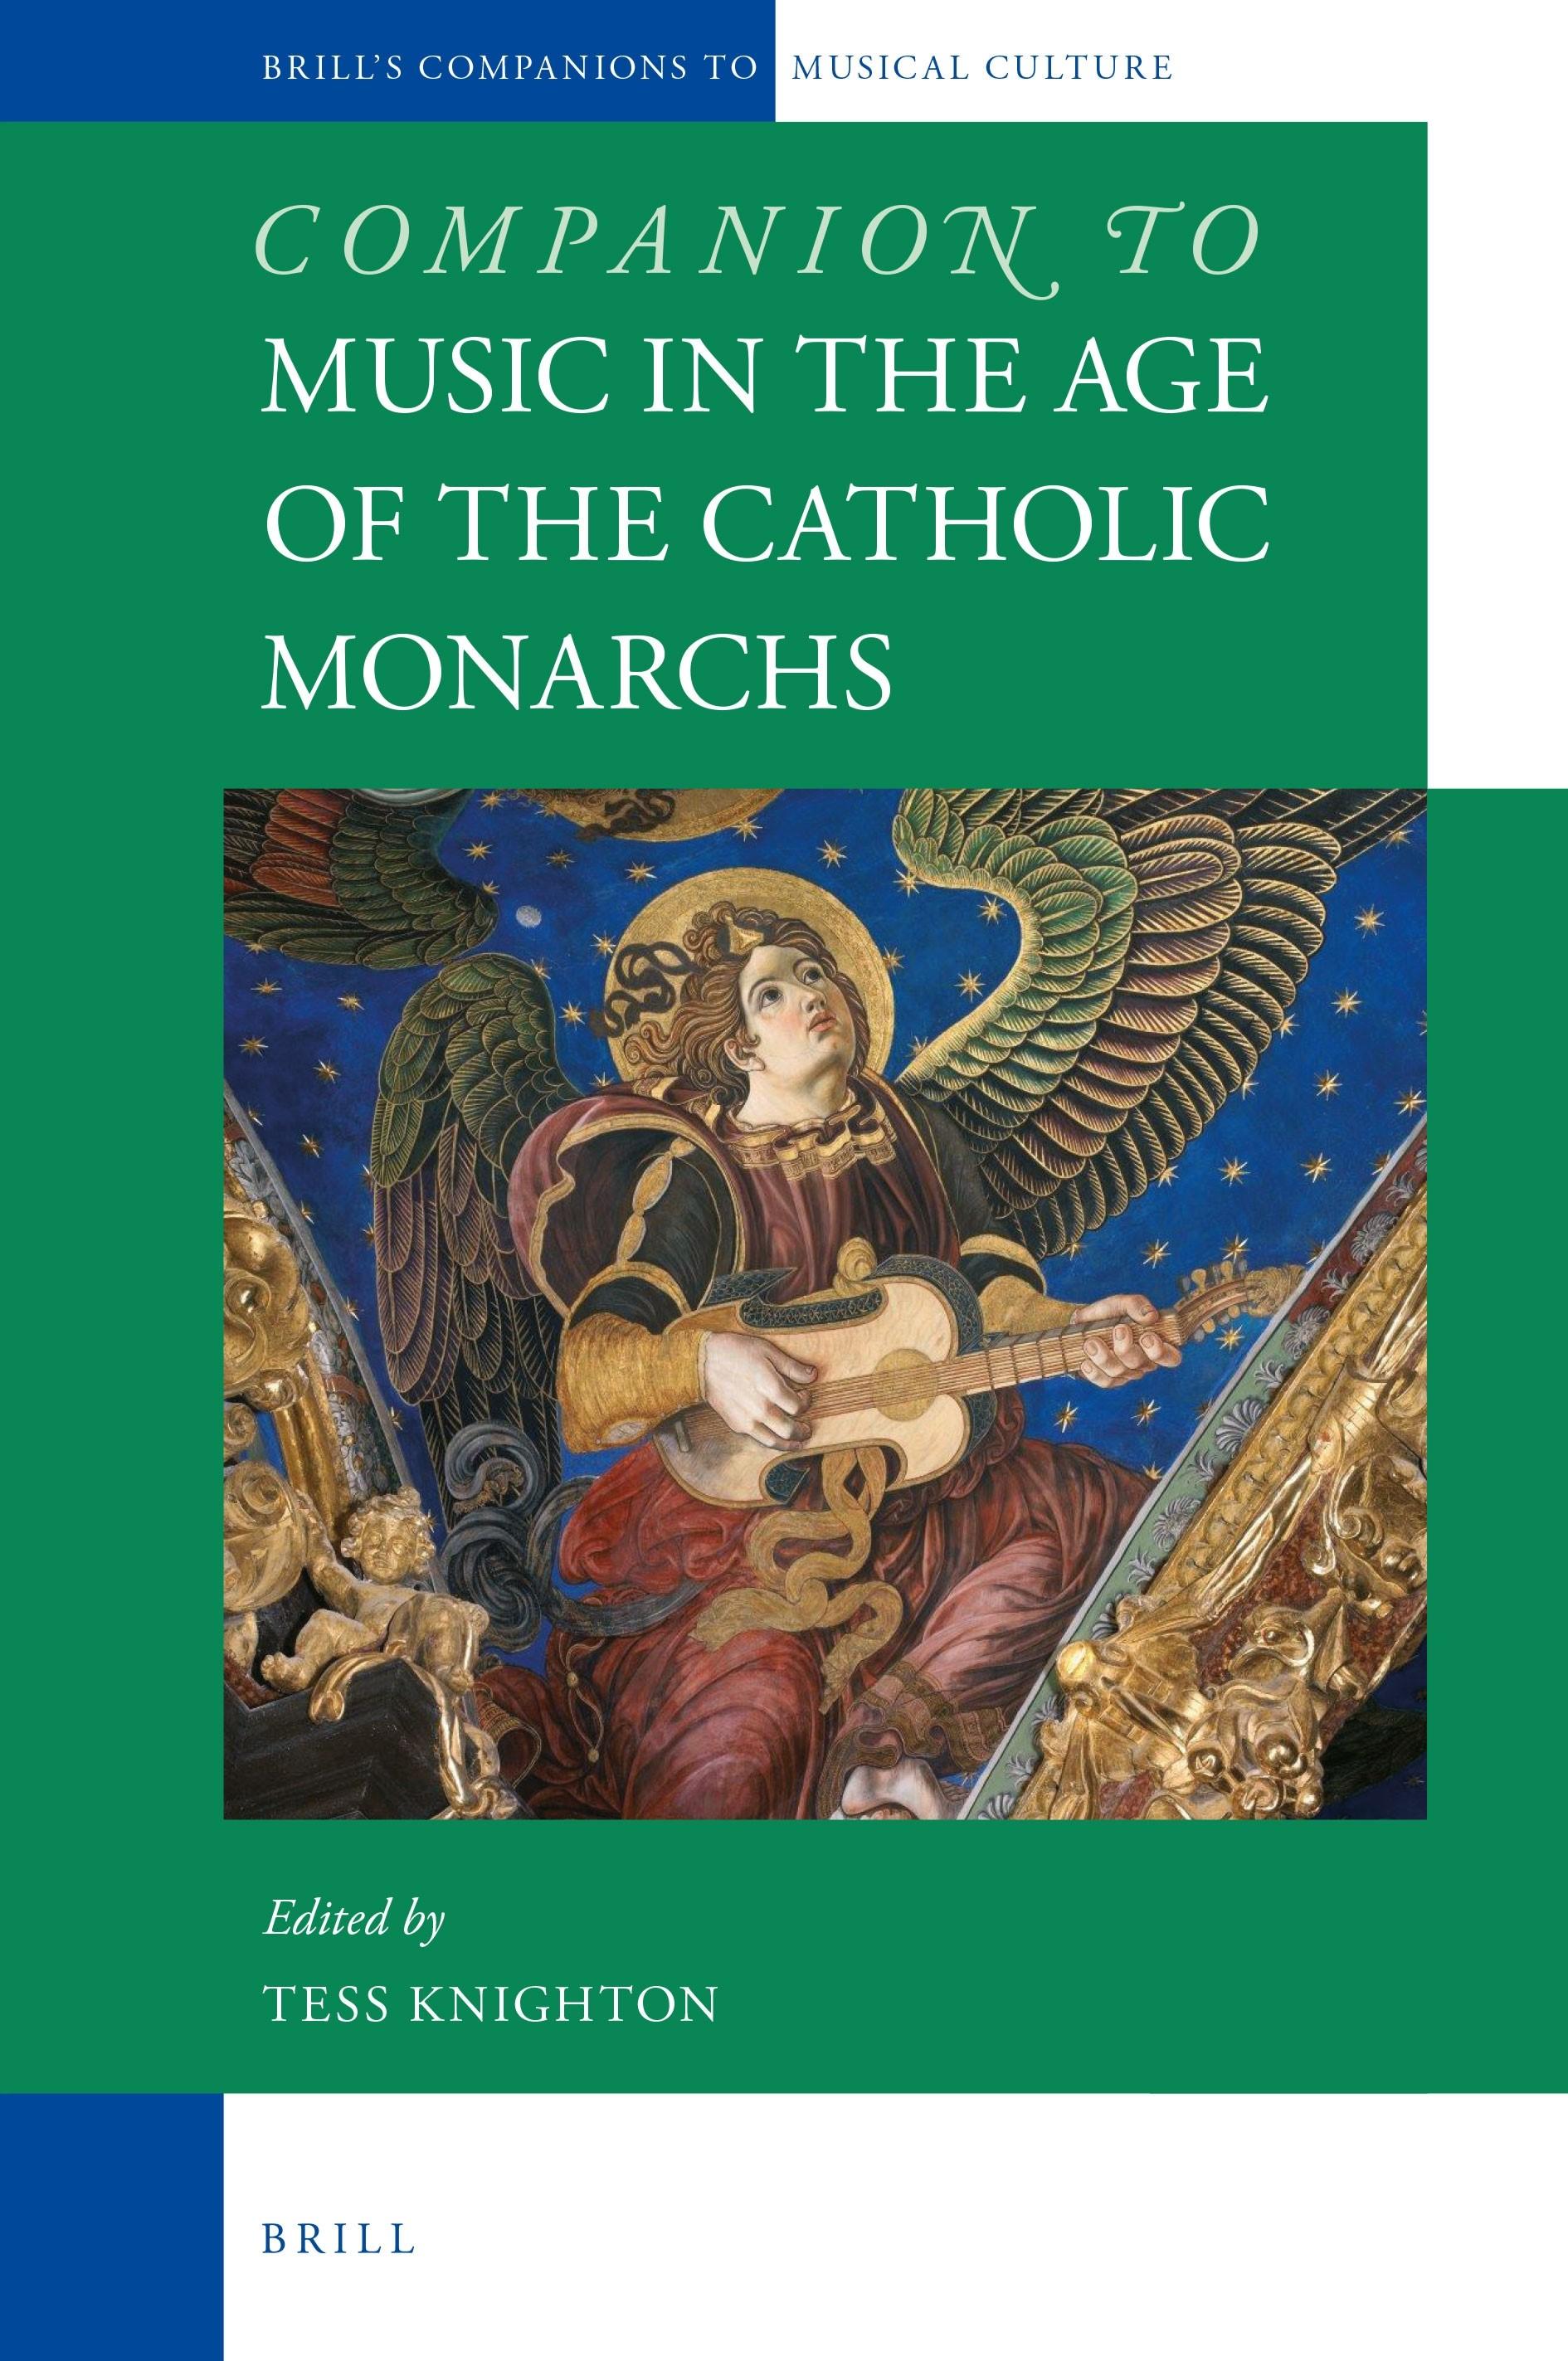 Abbildung von Companion to Music in the Age of the Catholic Monarchs | 2016